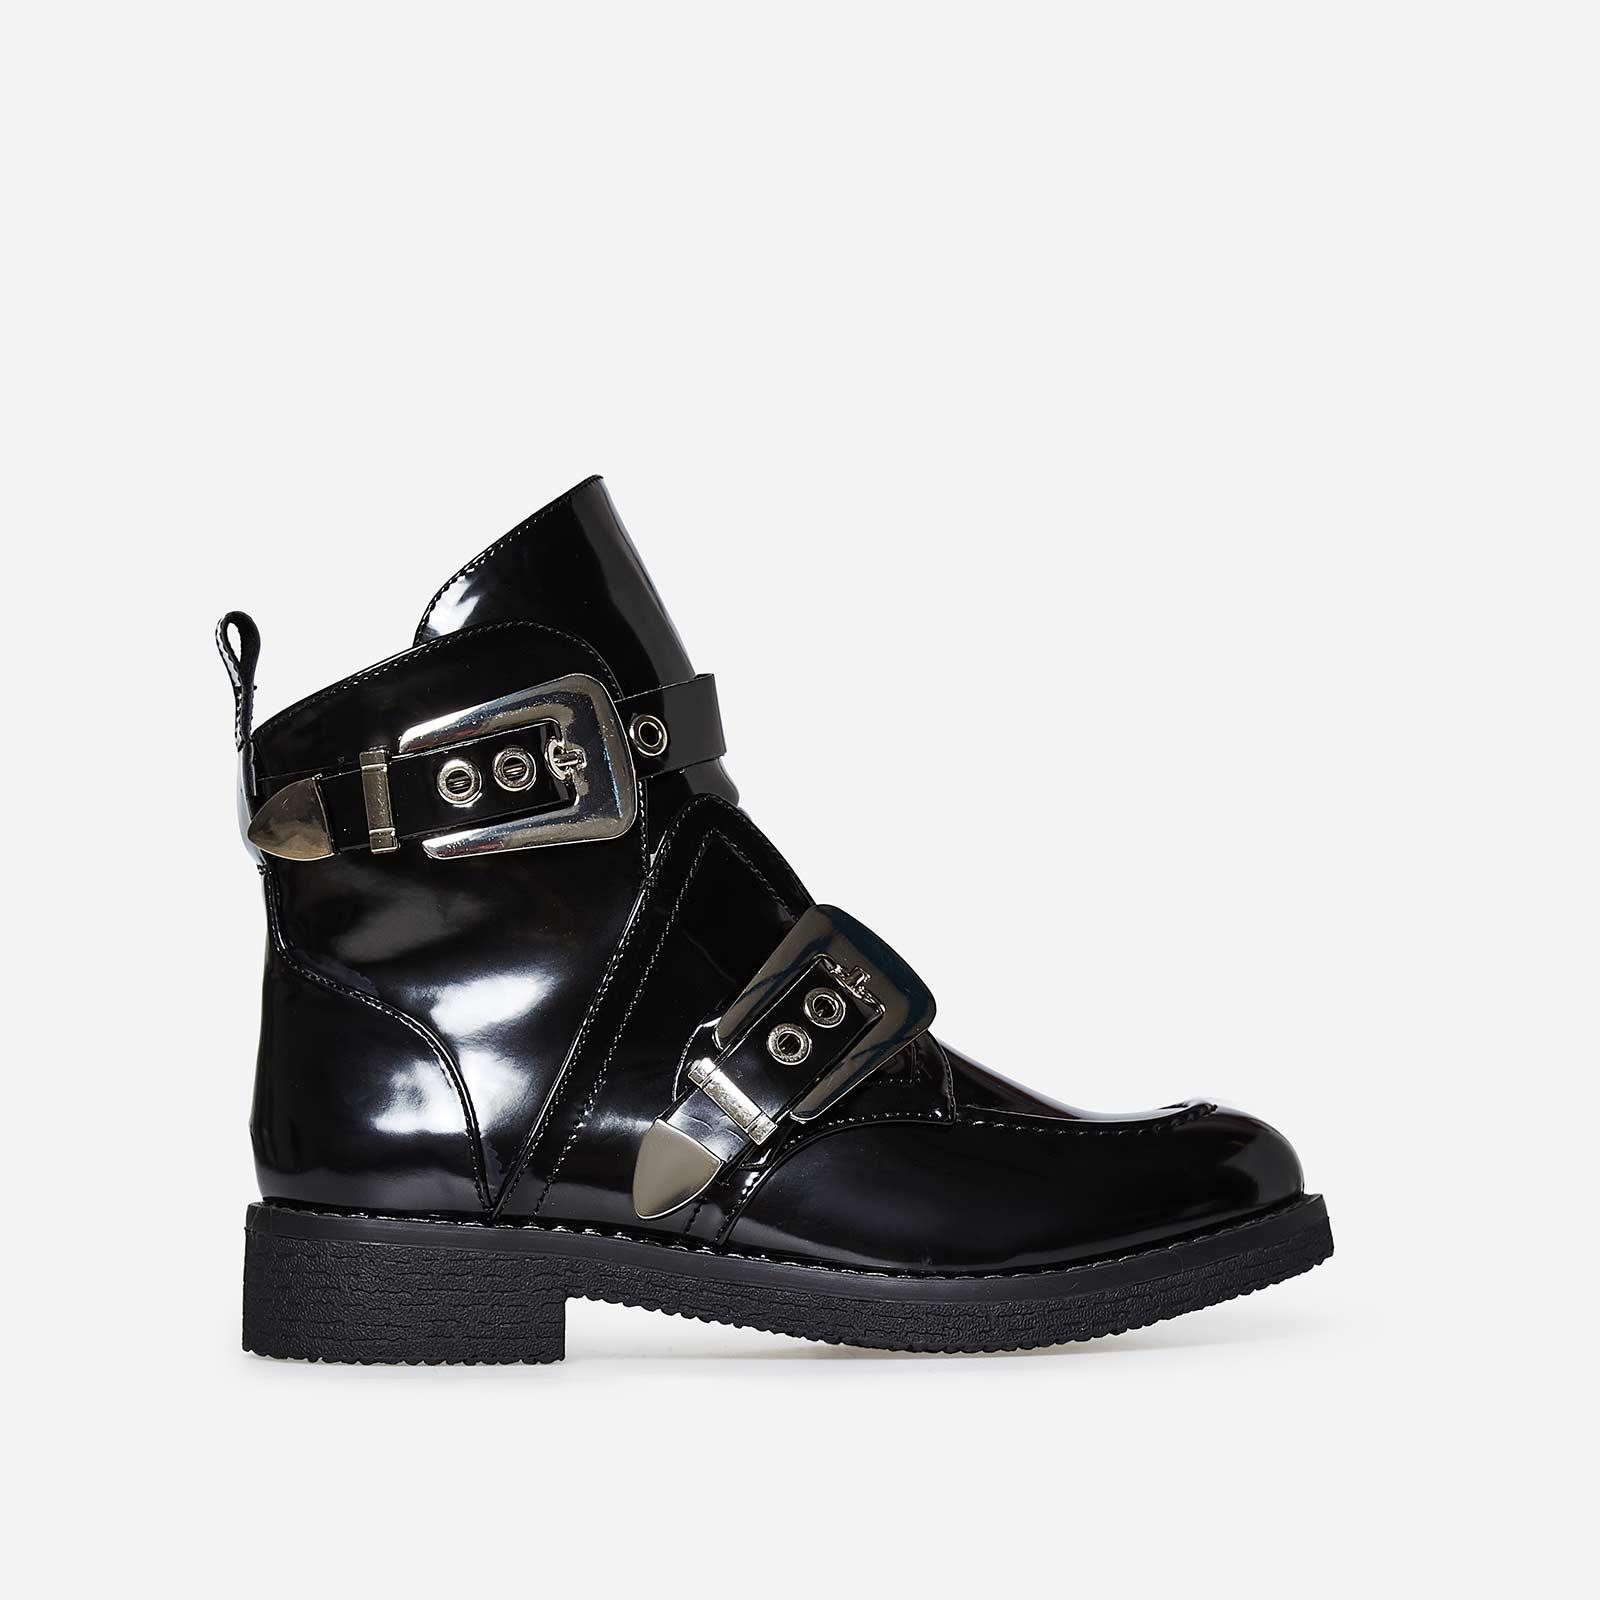 Veyron Buckle Detail Biker Boot In Black Patent